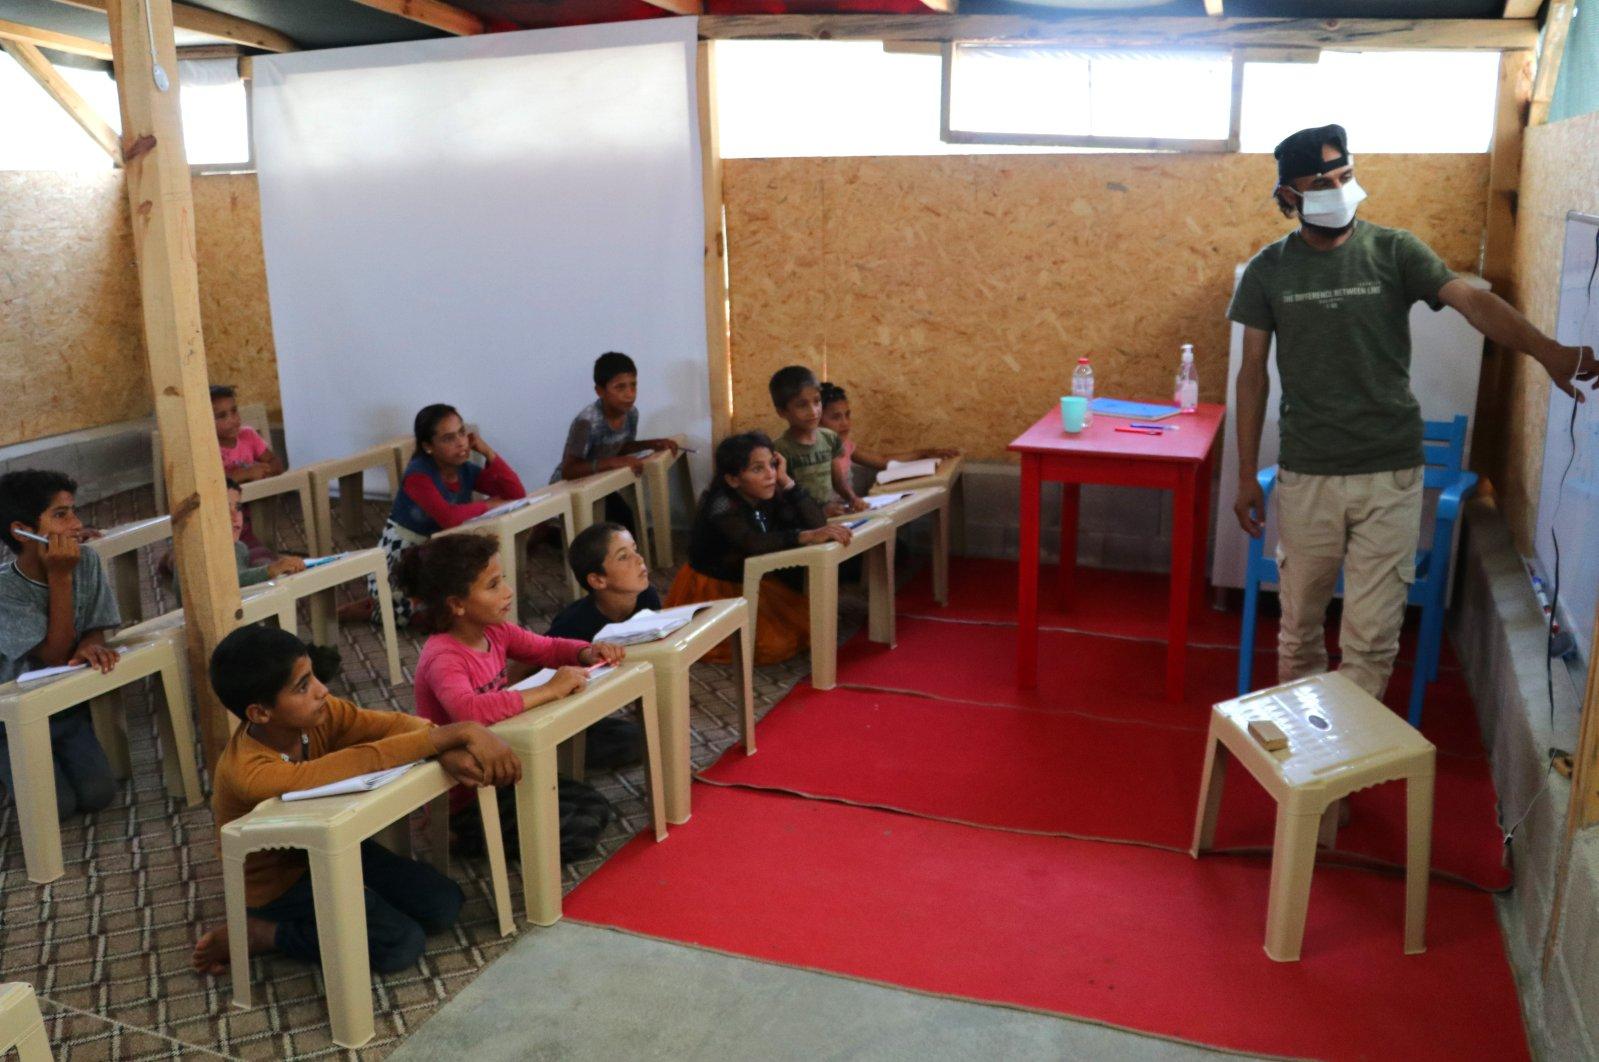 Ahmed Muhemid teaches his students inside the classroom, in Adana, southern Turkey, July 27, 2021. (IHA PHOTO)